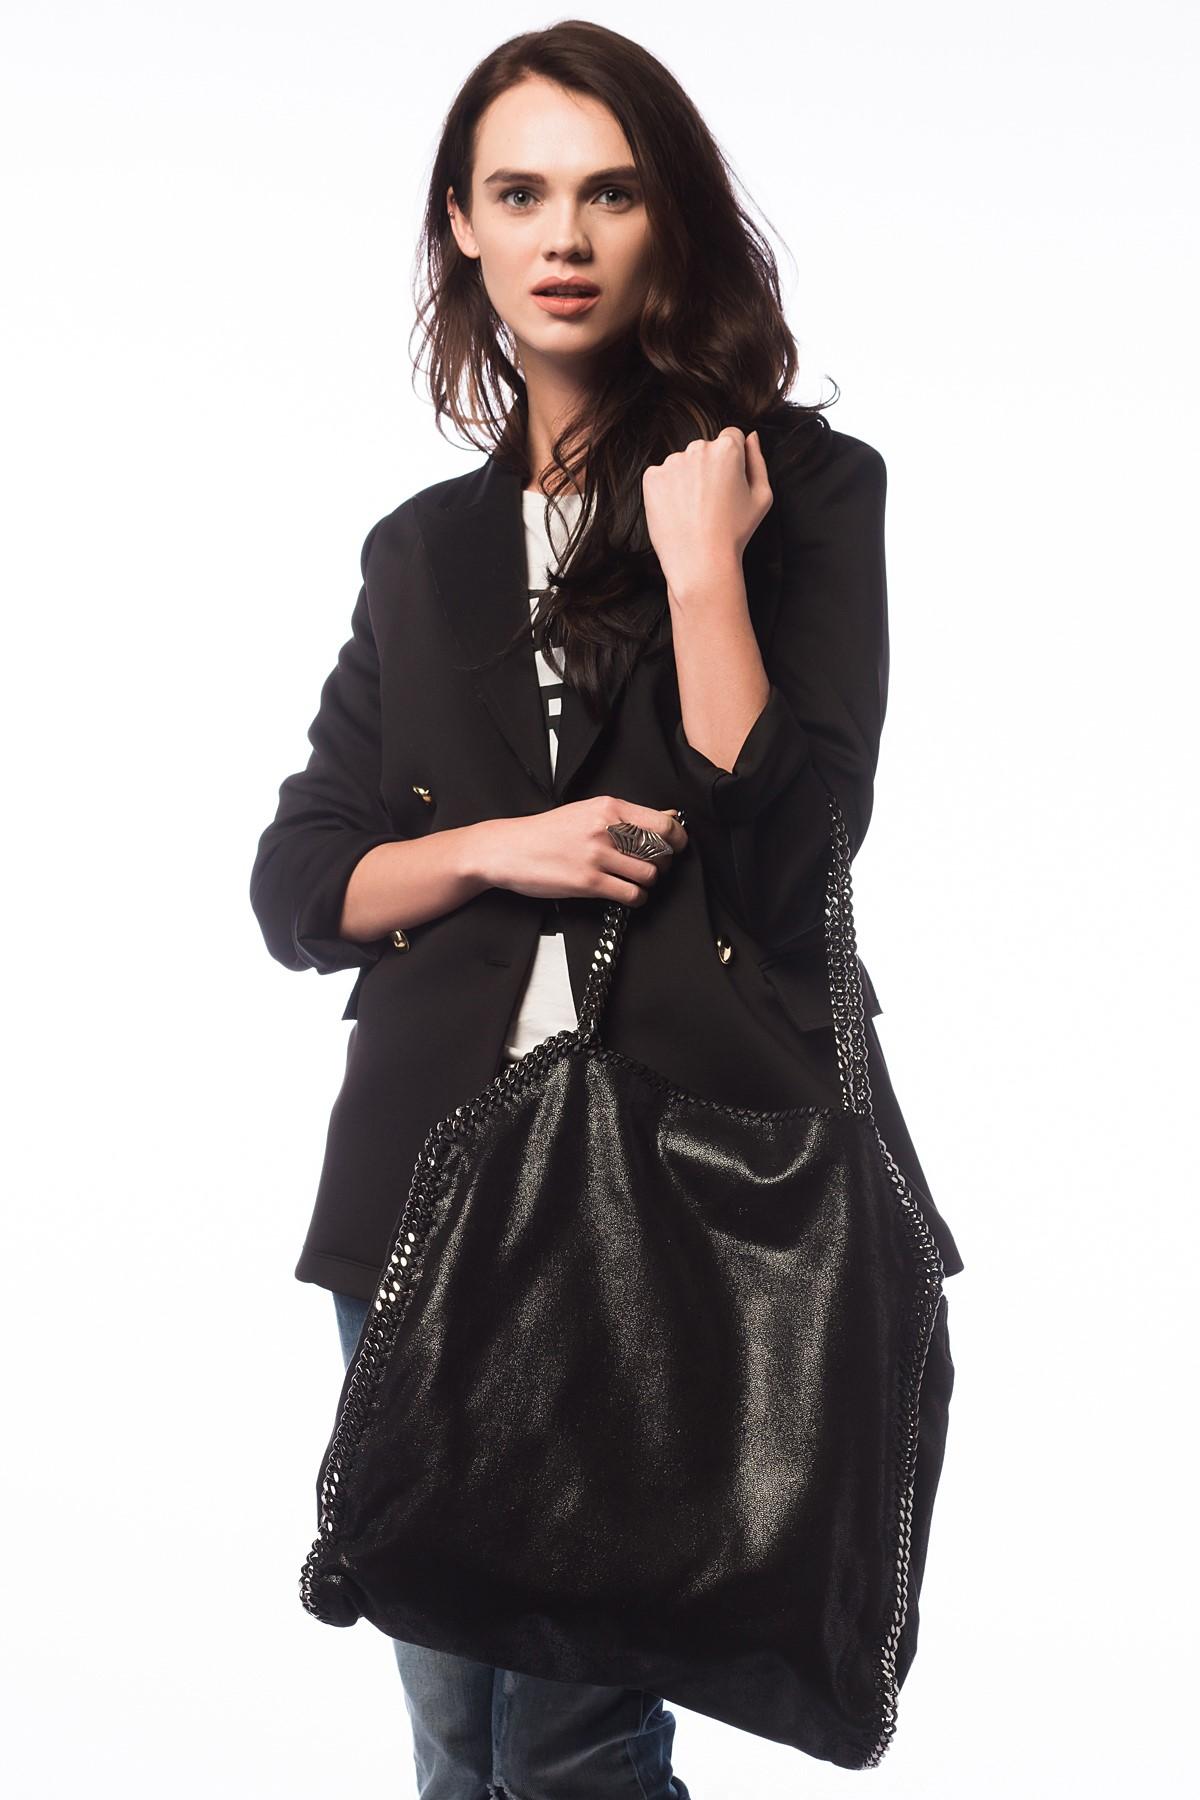 Siyah 2015 Stella McCartney Çanta Modelleri